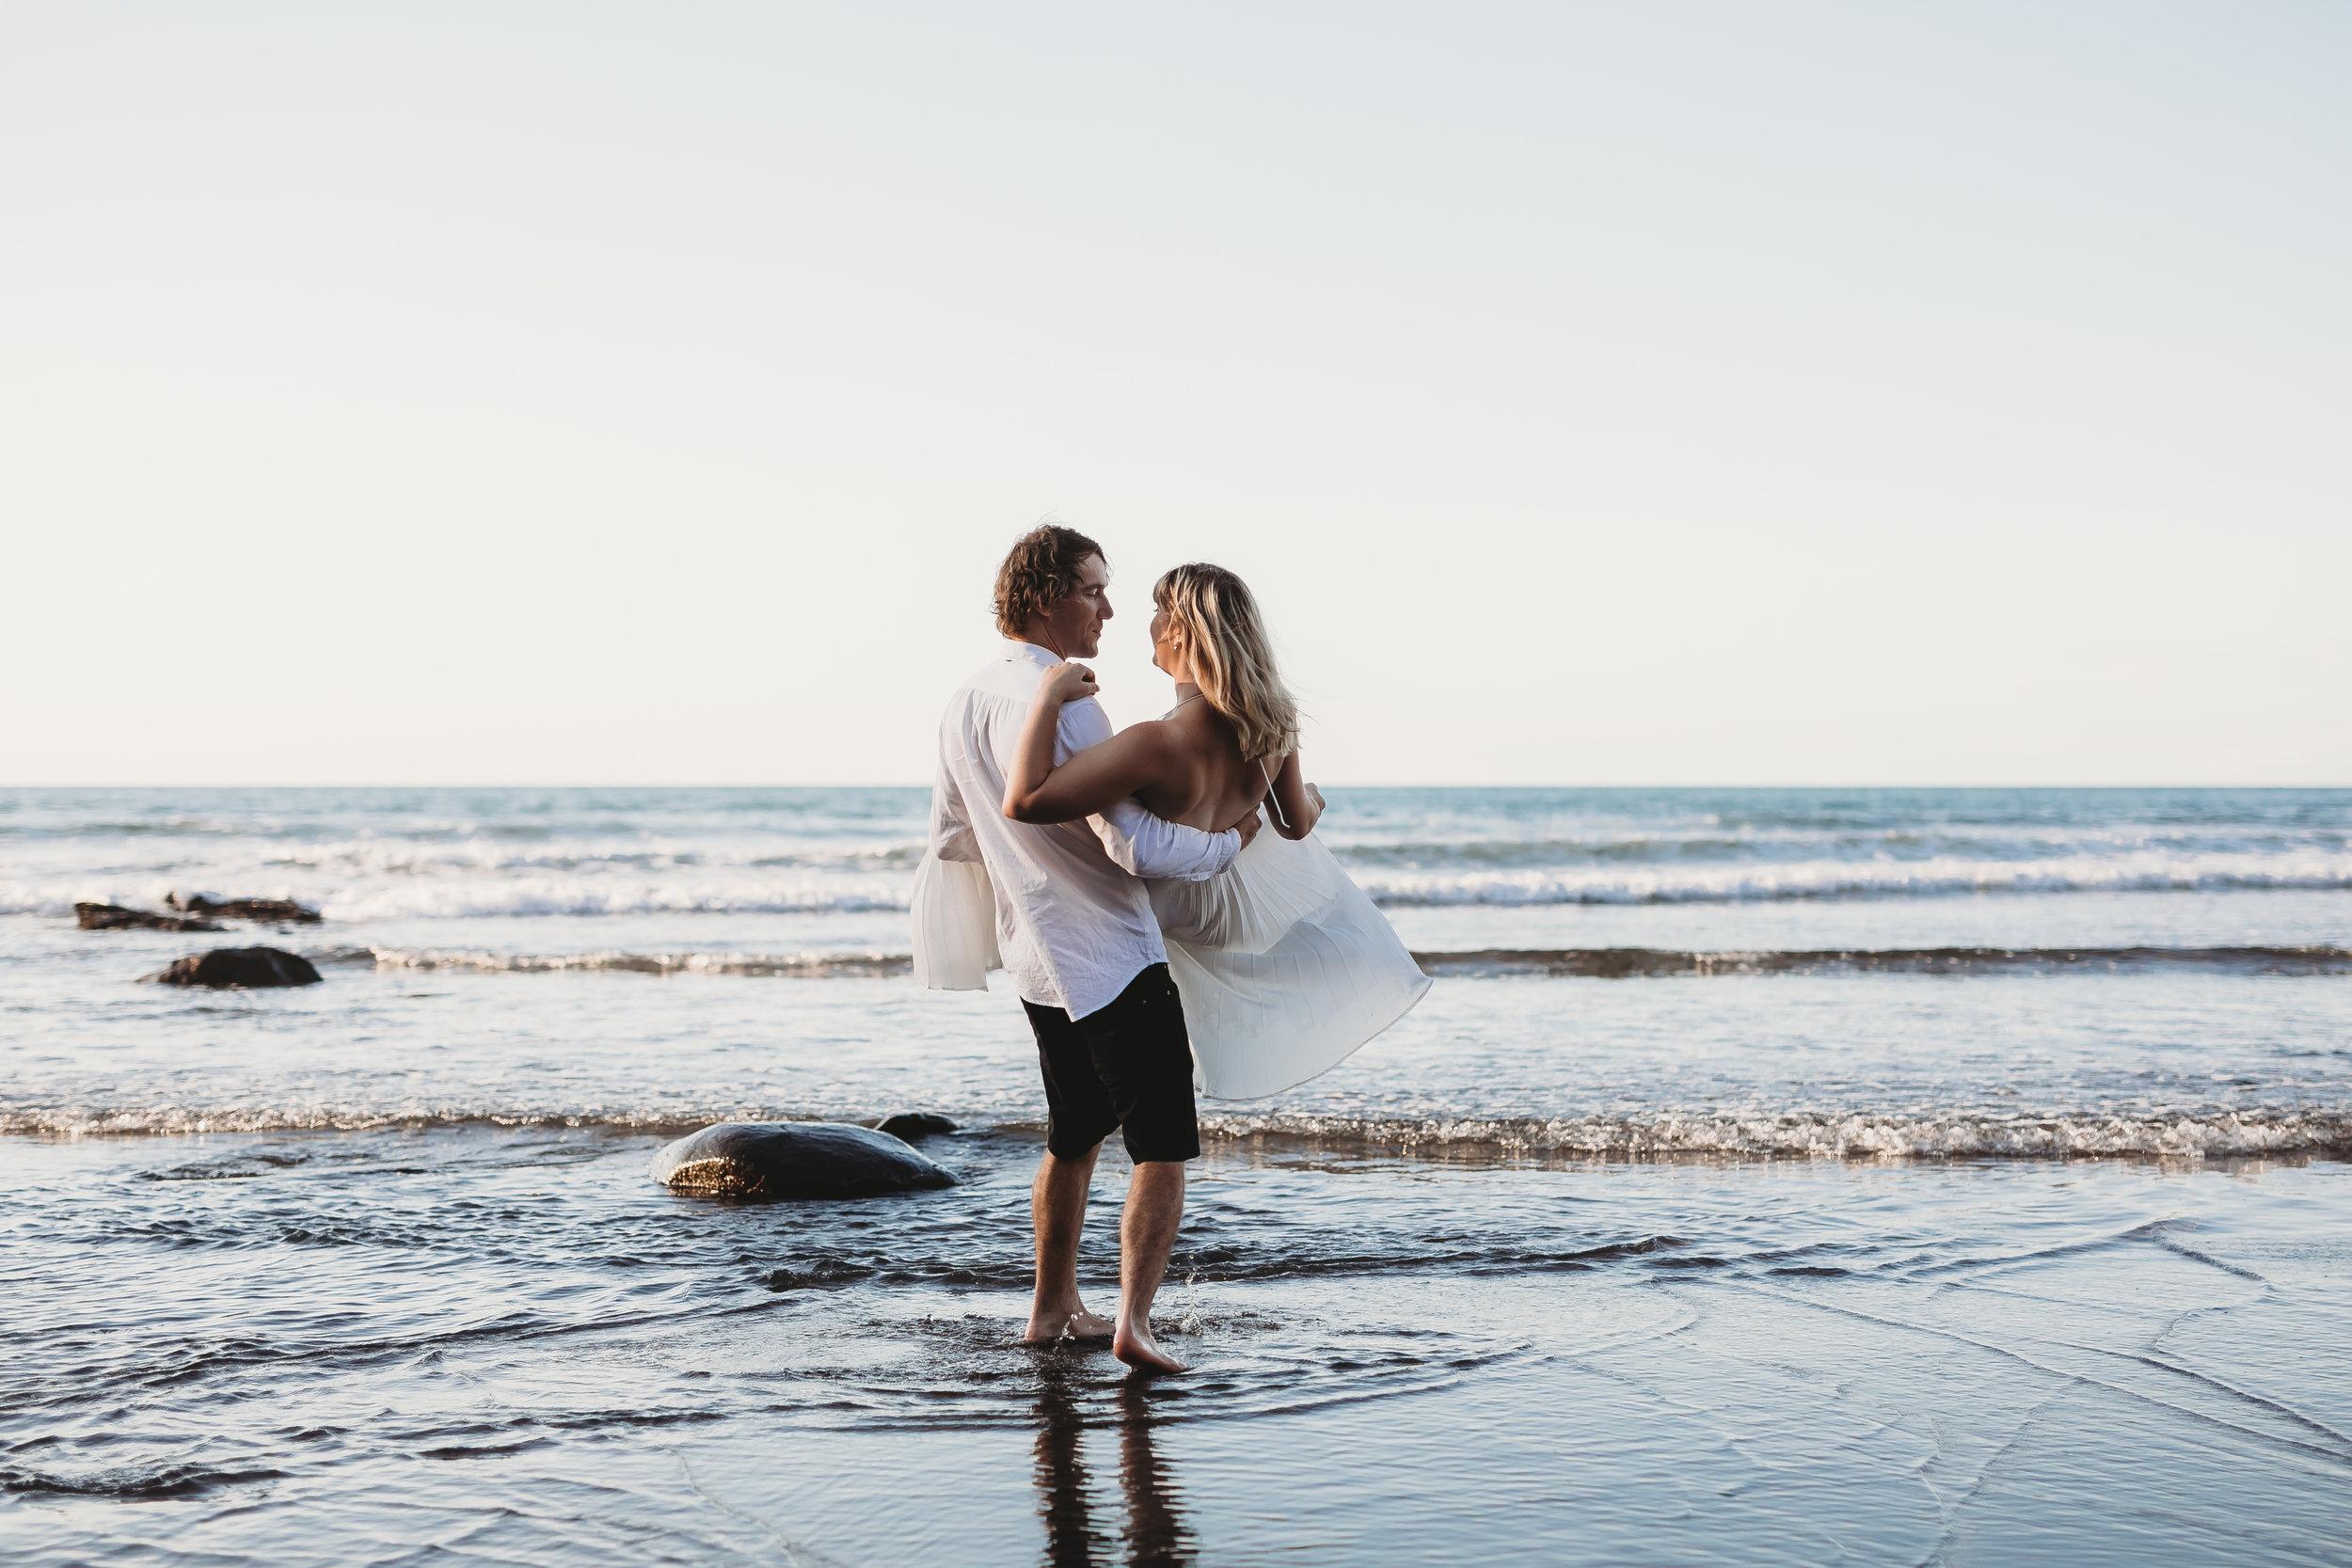 Raglan-beach-couples-engagement-photo-shoot (60 of 79).jpg